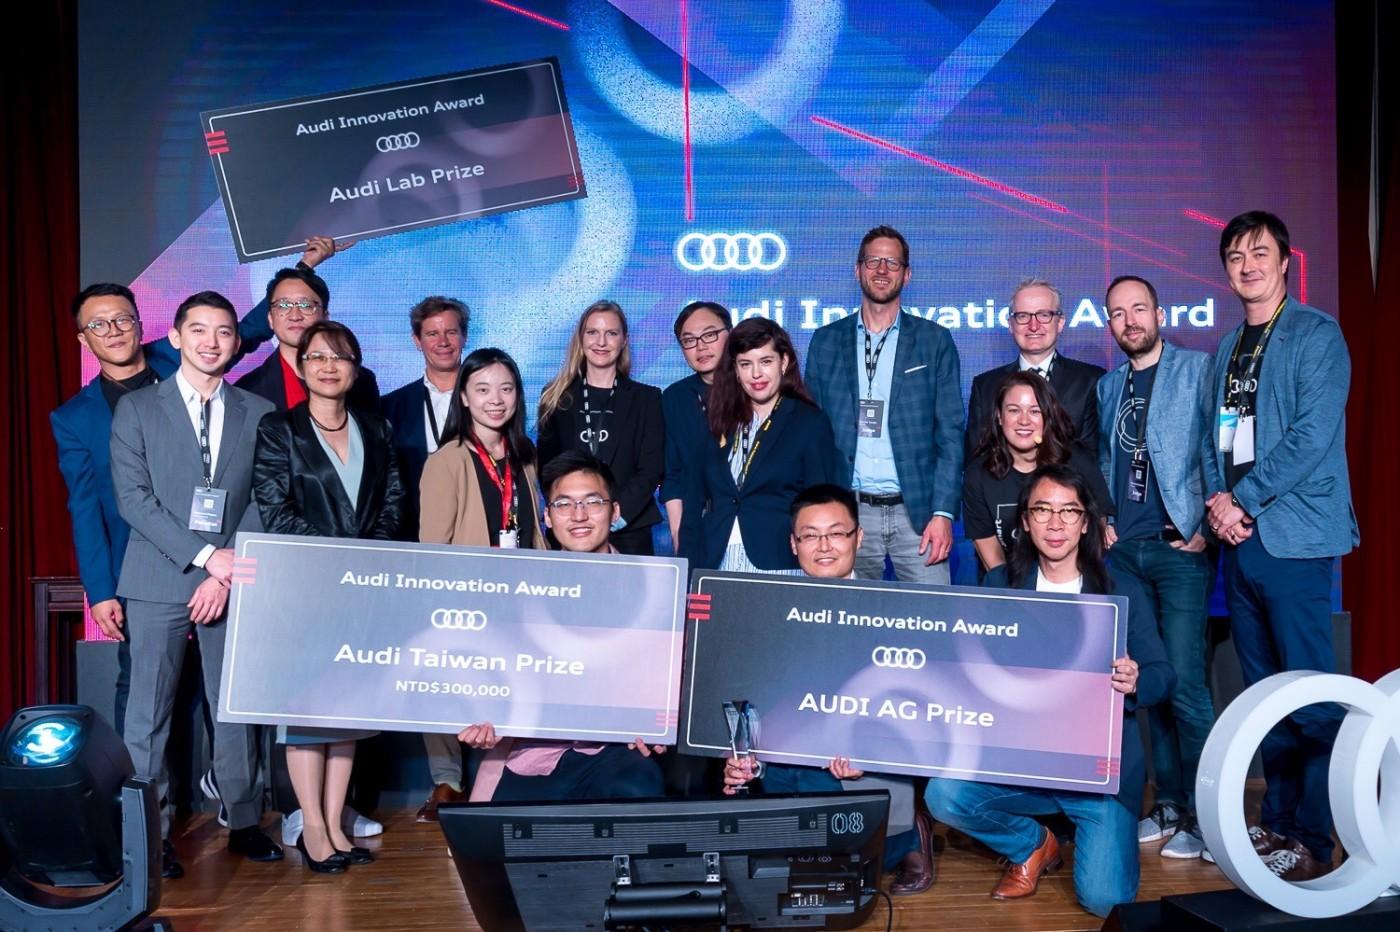 COMPUTEX 2019 Audi Innovation Award 鏈結國際資源 見證台灣新創能量